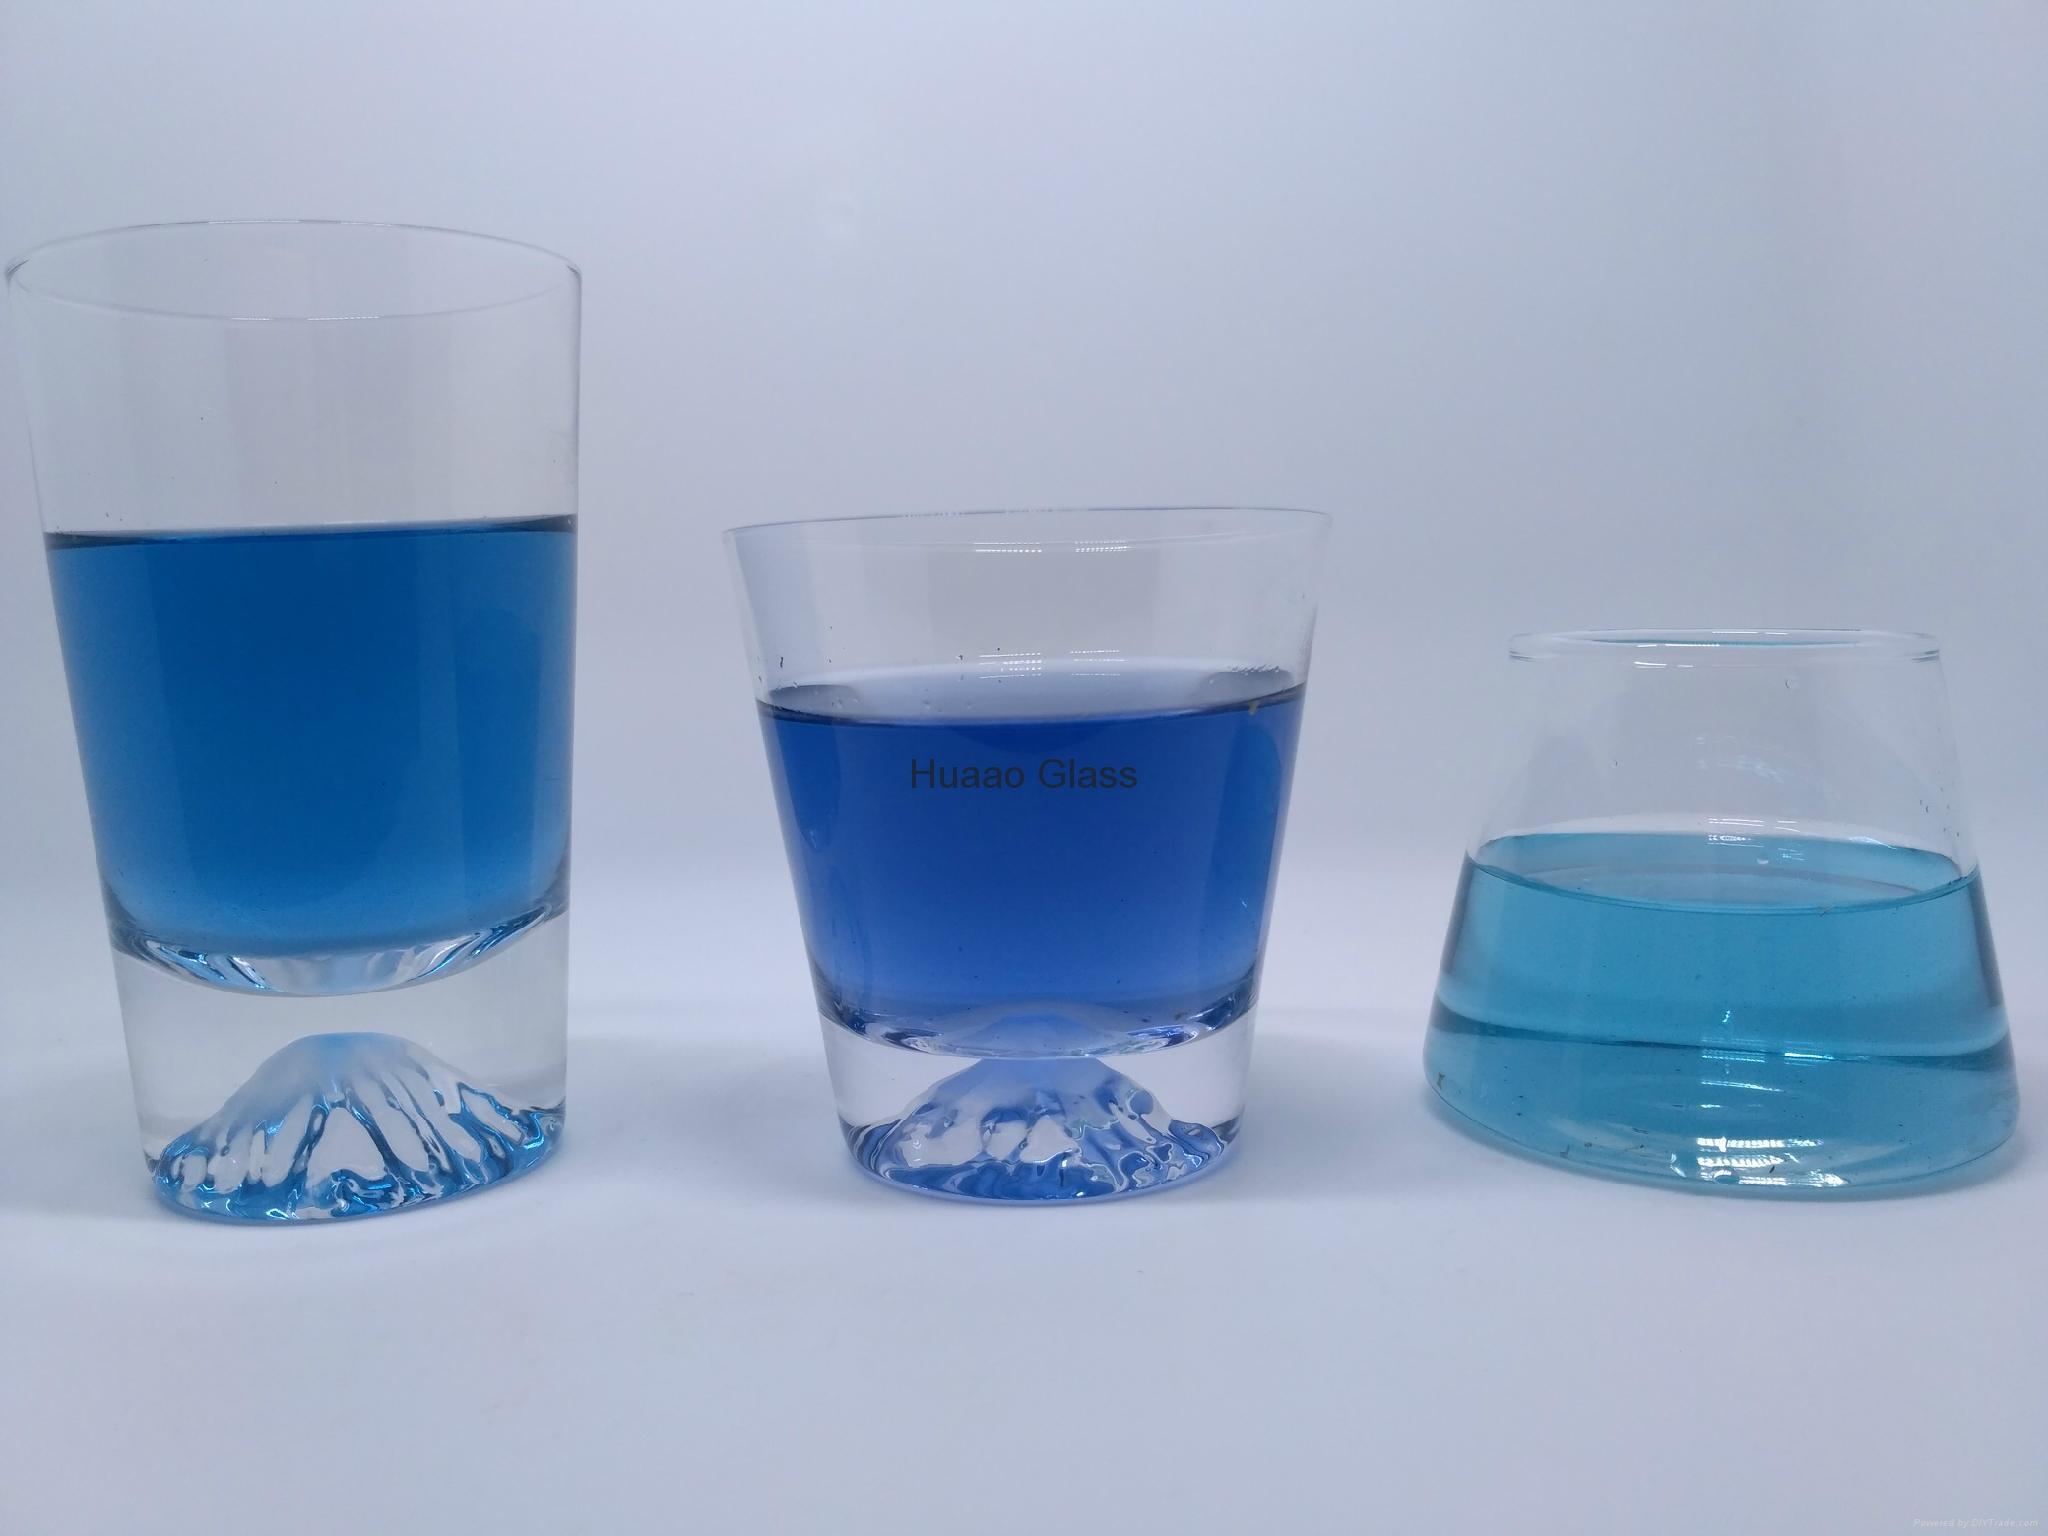 Cangzhou Borosilicate handmade short glass cup Fuji shaped glass wine cups 1